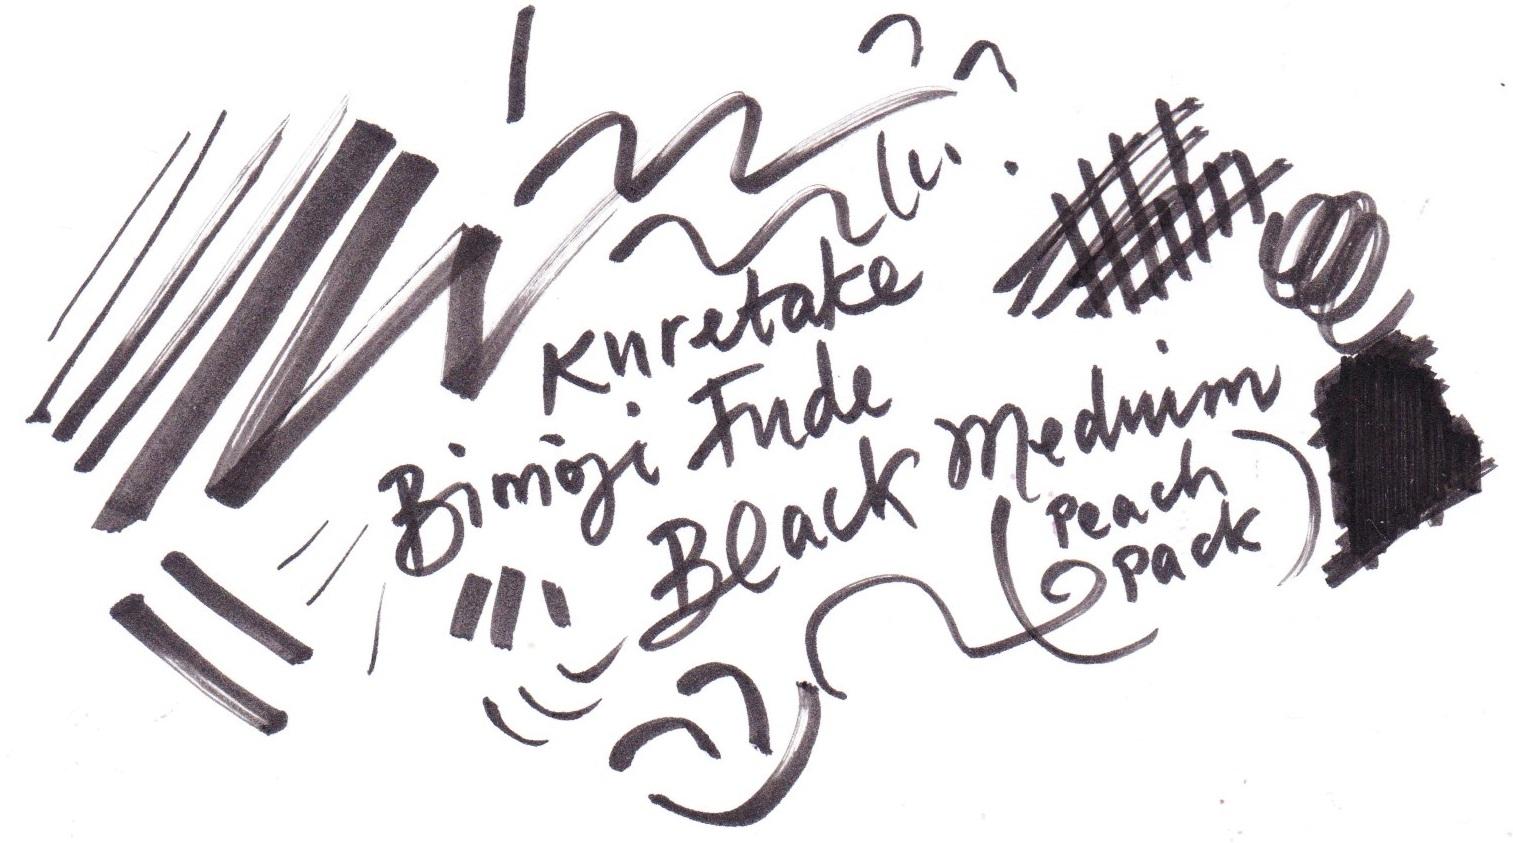 Kuretake Bimoji Fude medium on Bristol board